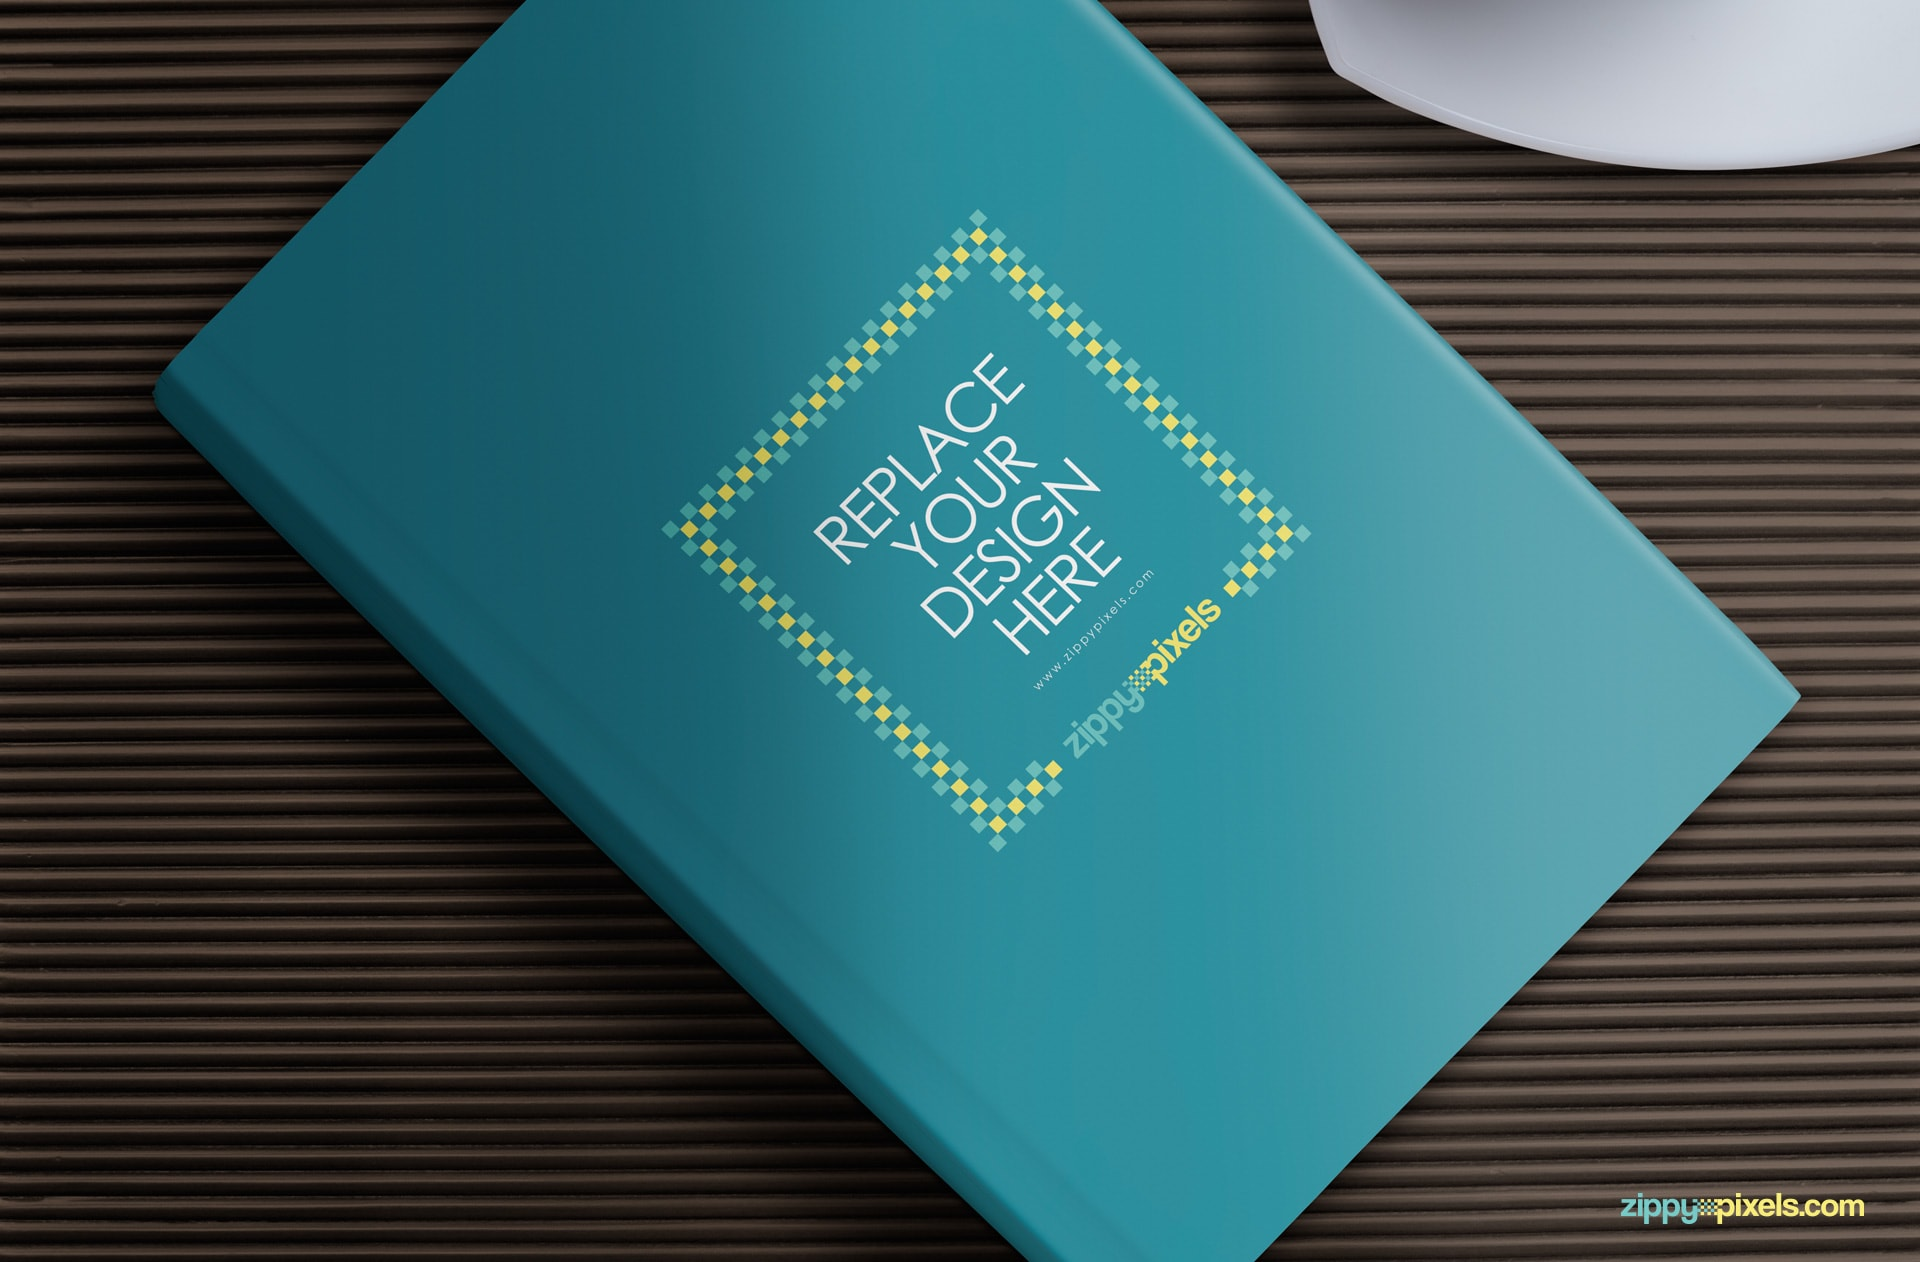 Book Cover Design Mockup : Free book mockup for hardcover designs zippypixels